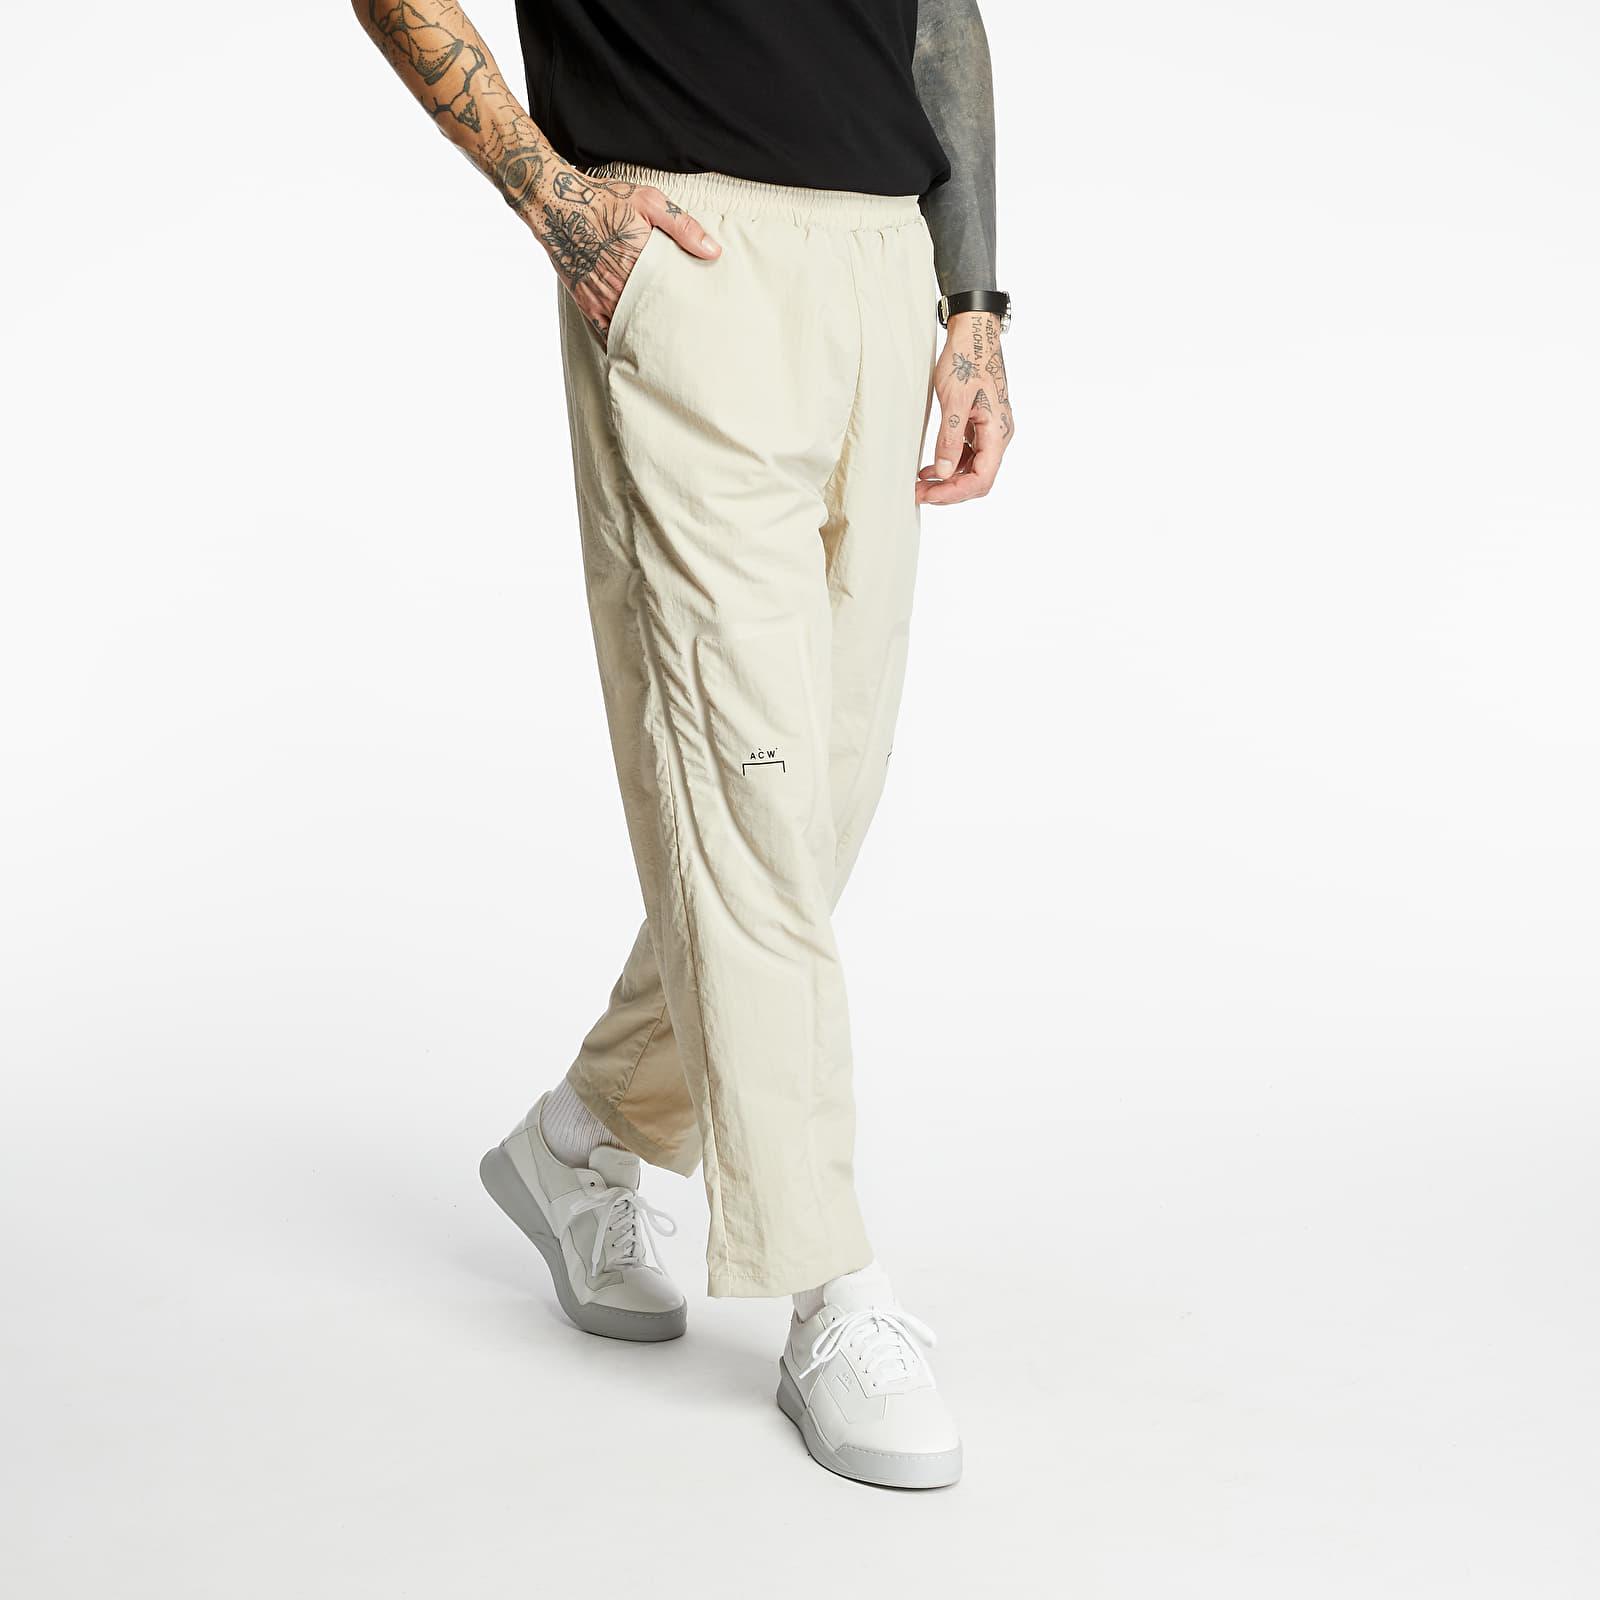 Pants and jeans A-COLD-WALL* Tonal Print Pants Moonbeam